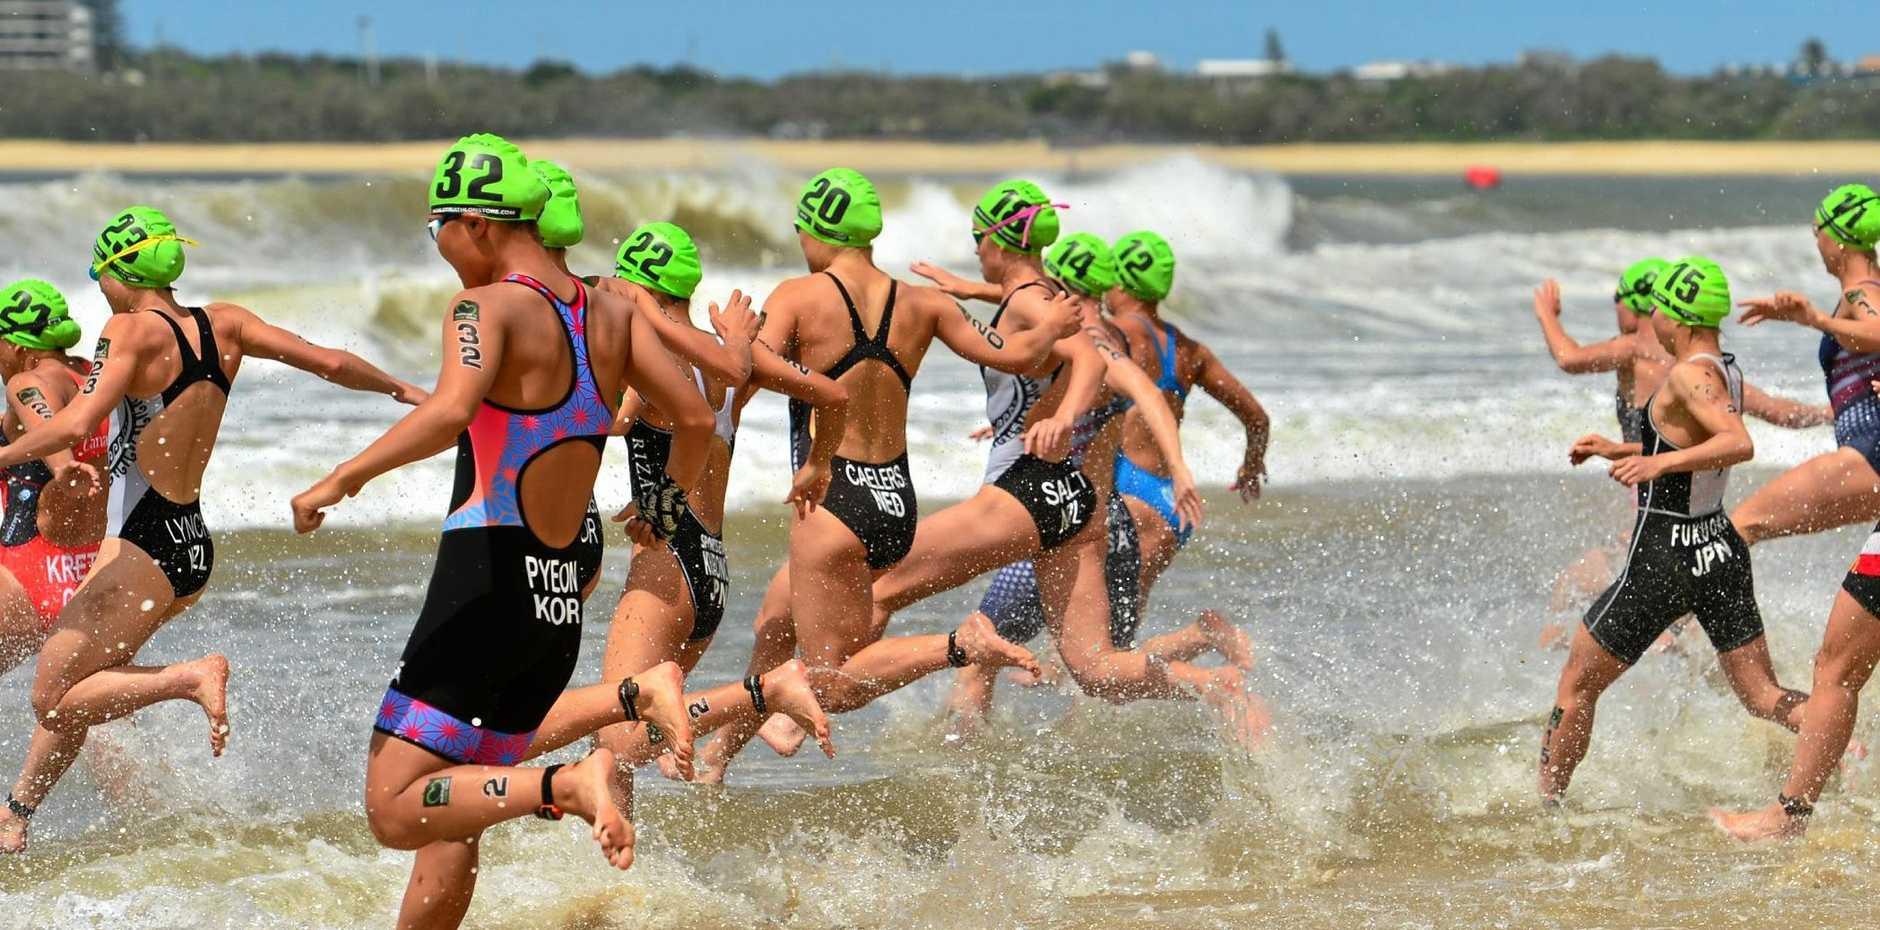 The Mooloolaba Triathlon is officially under way